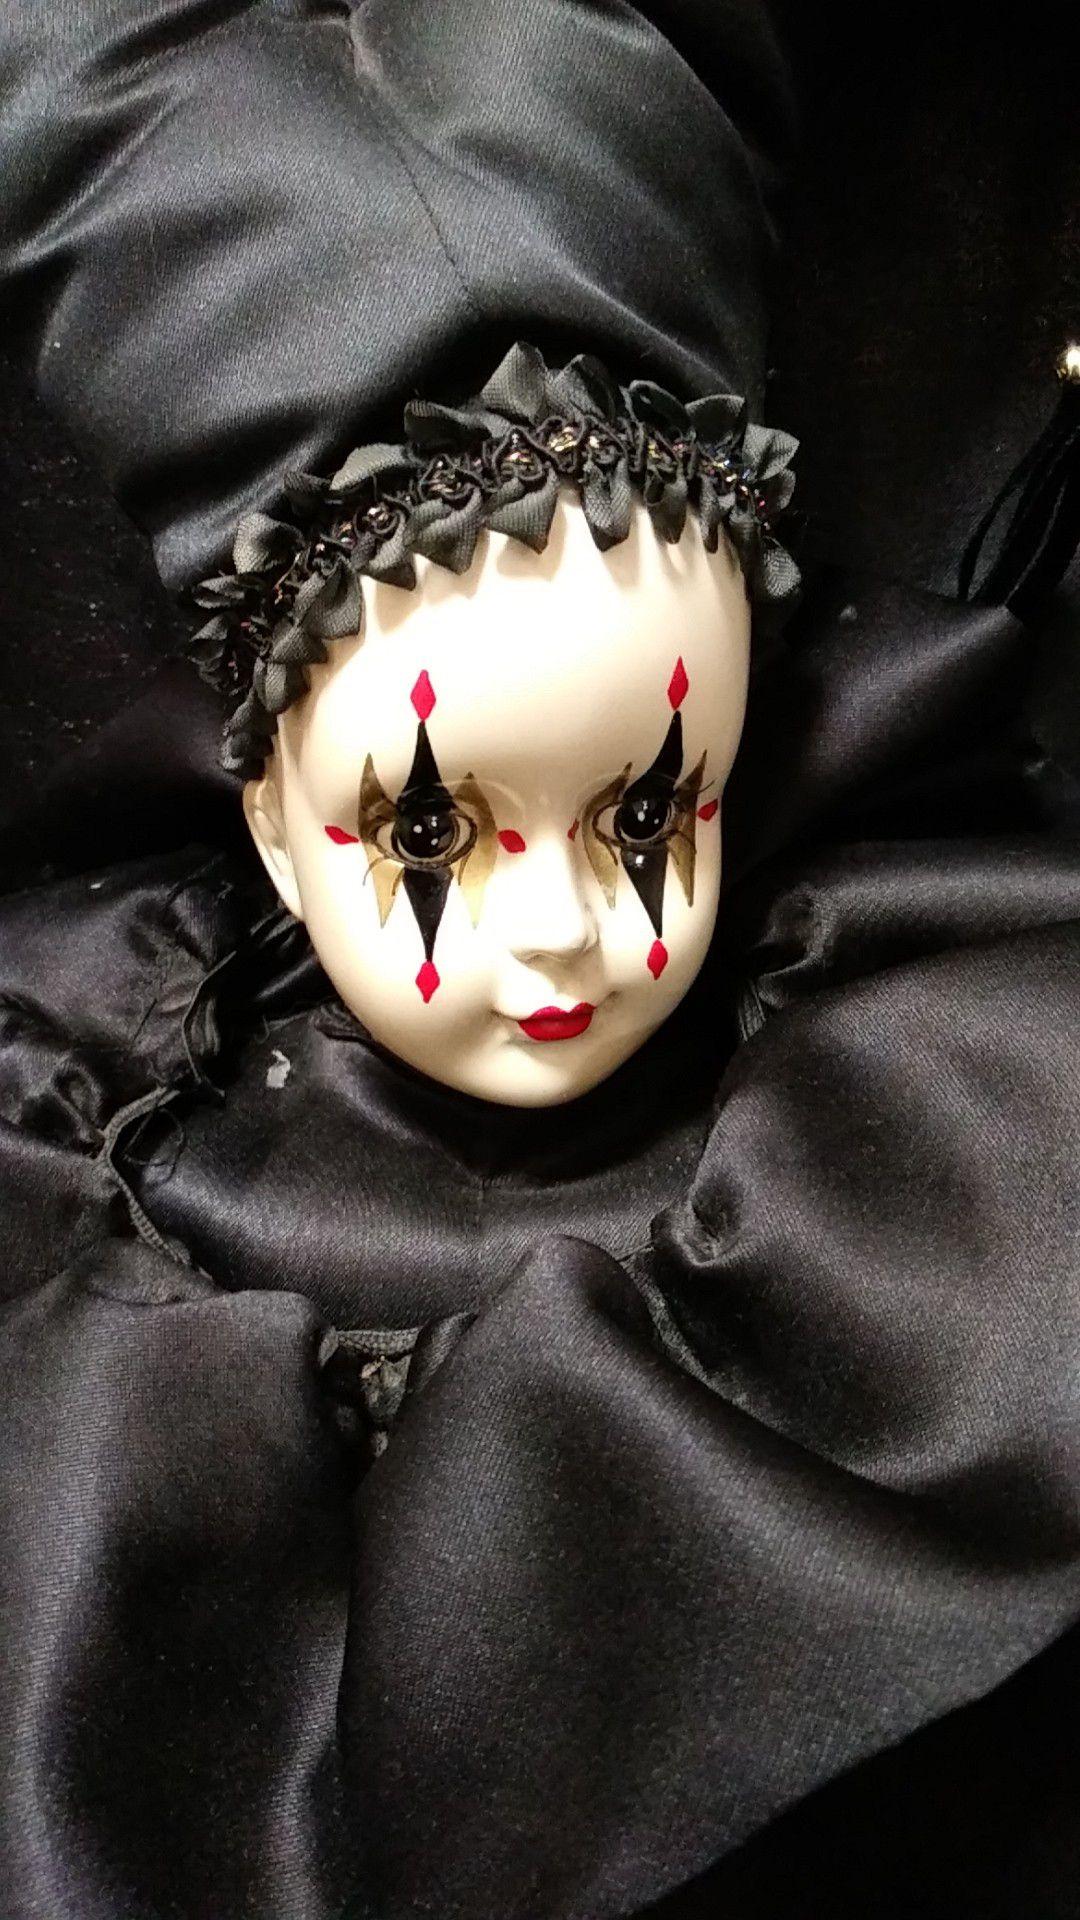 Collectible Edition Brinn's 1988 Doll